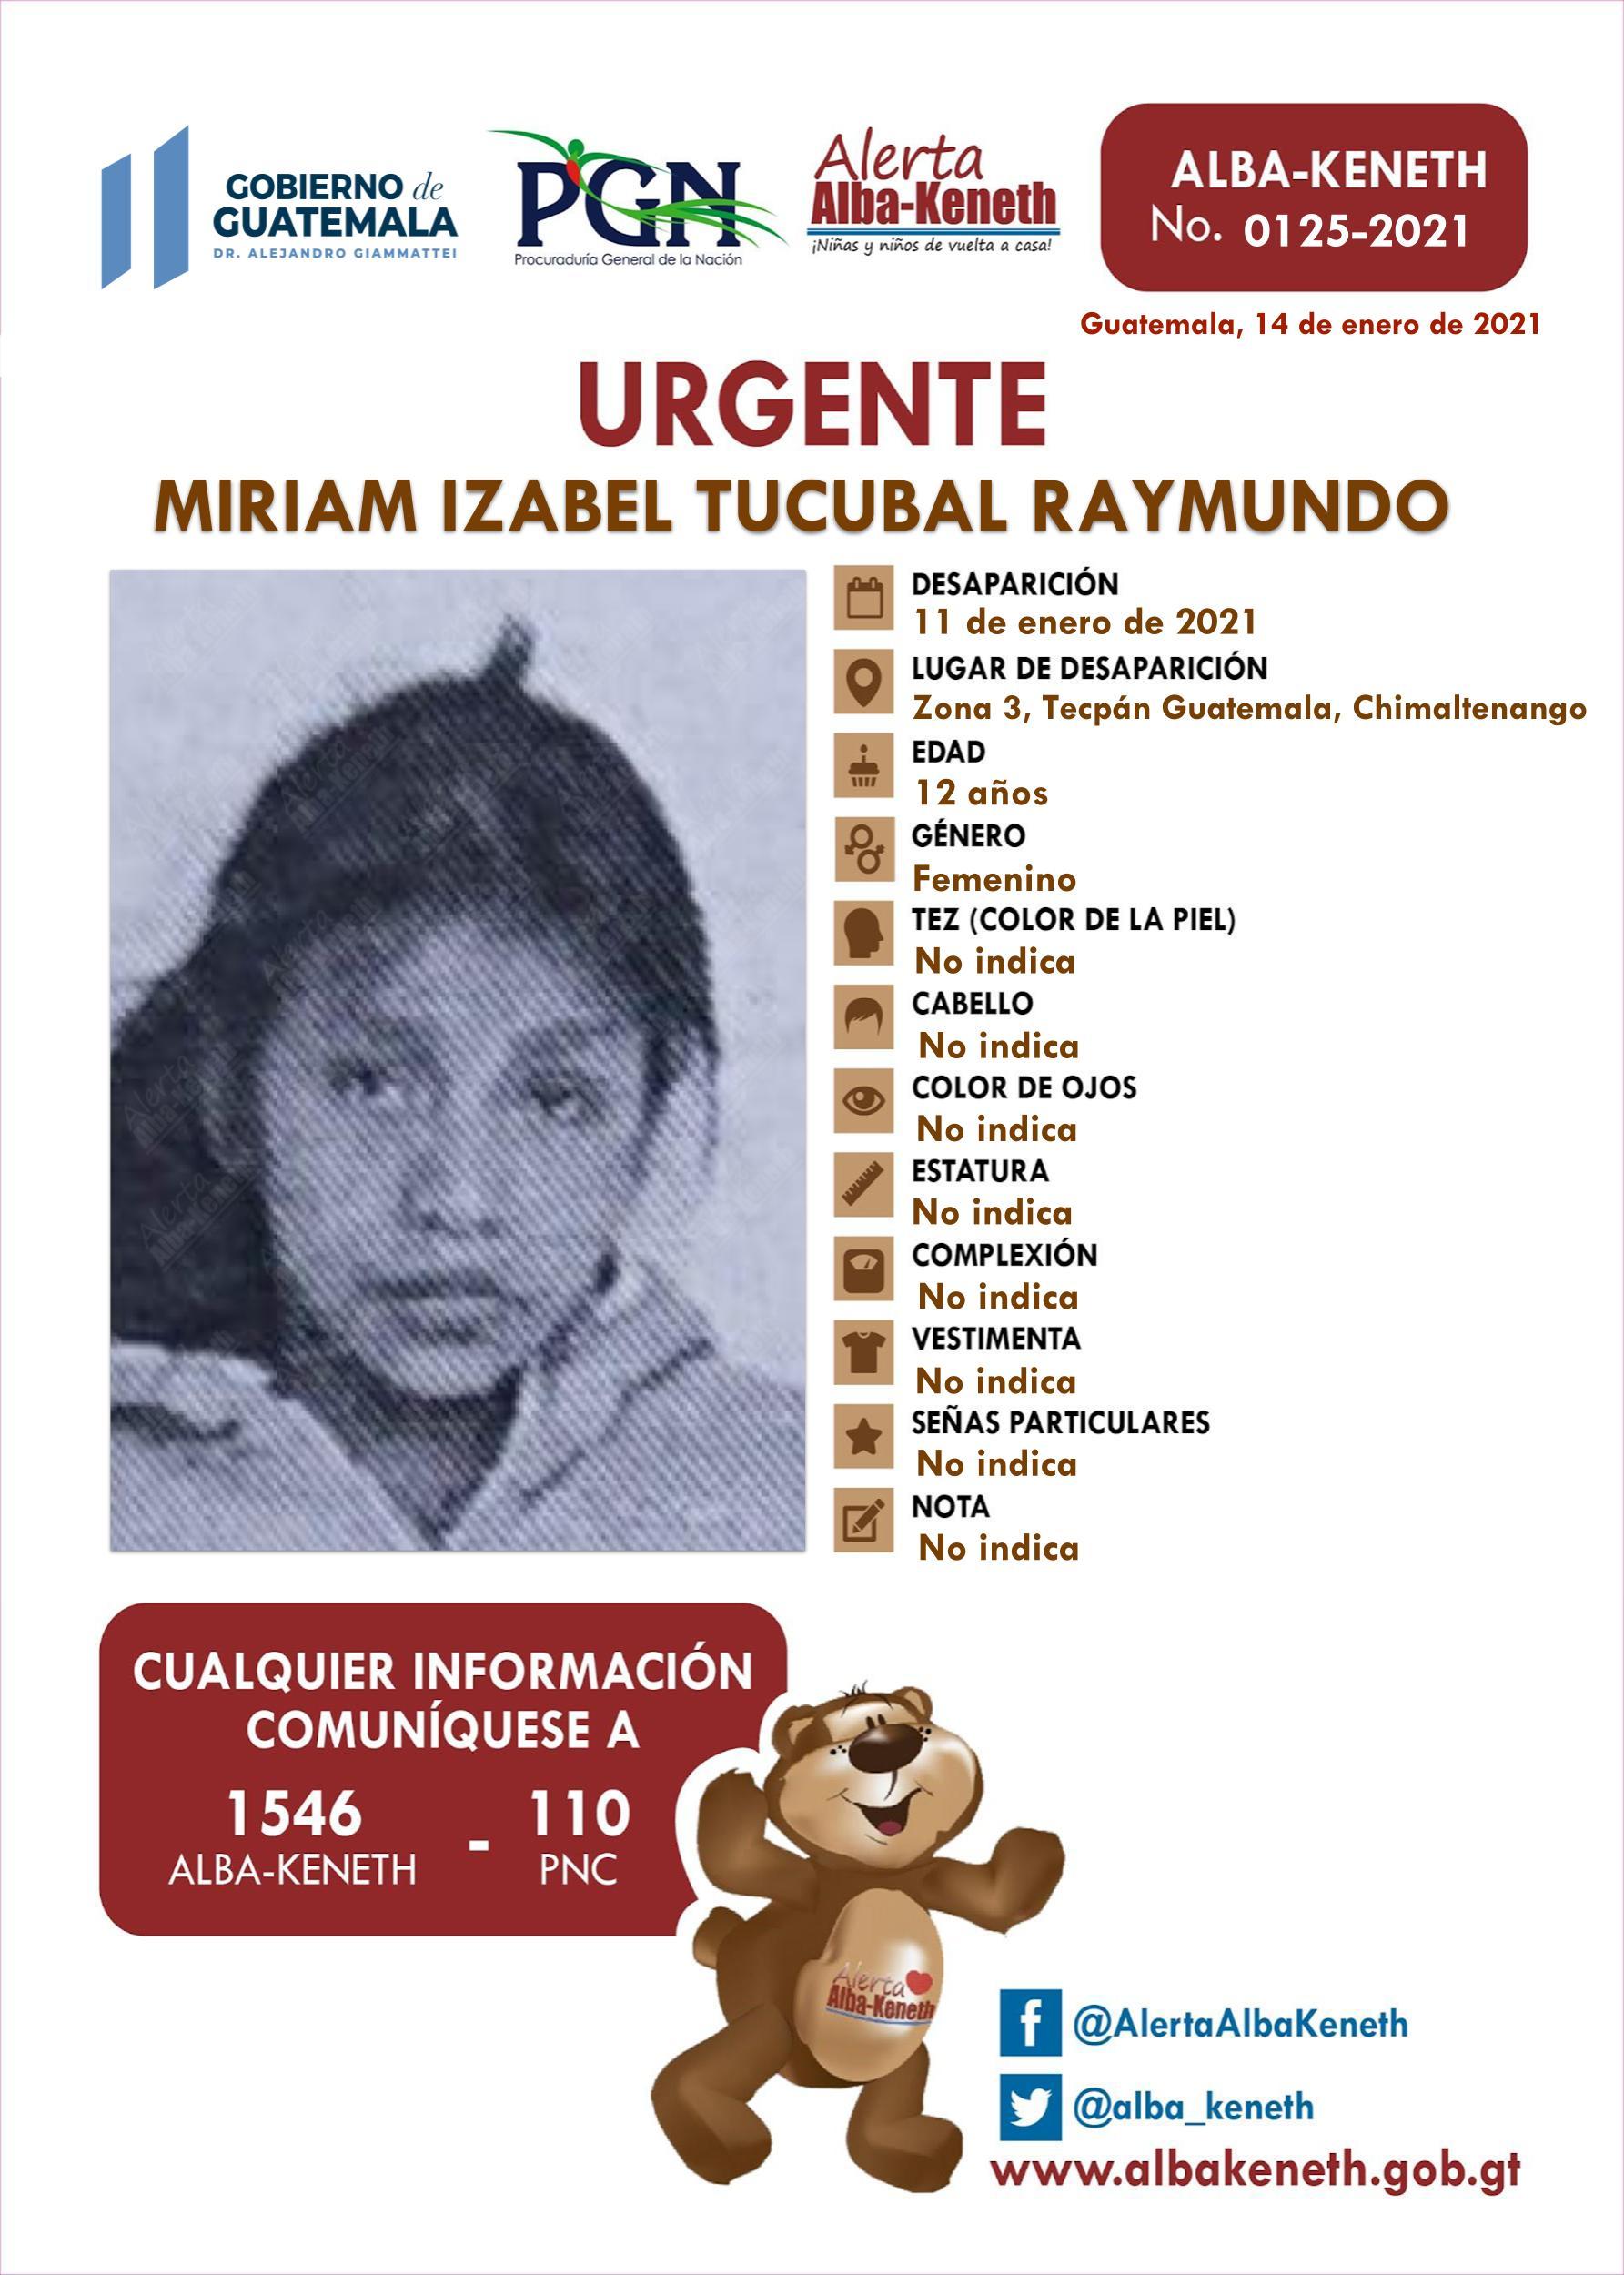 Miriam Izabel Tucubal Raymundo